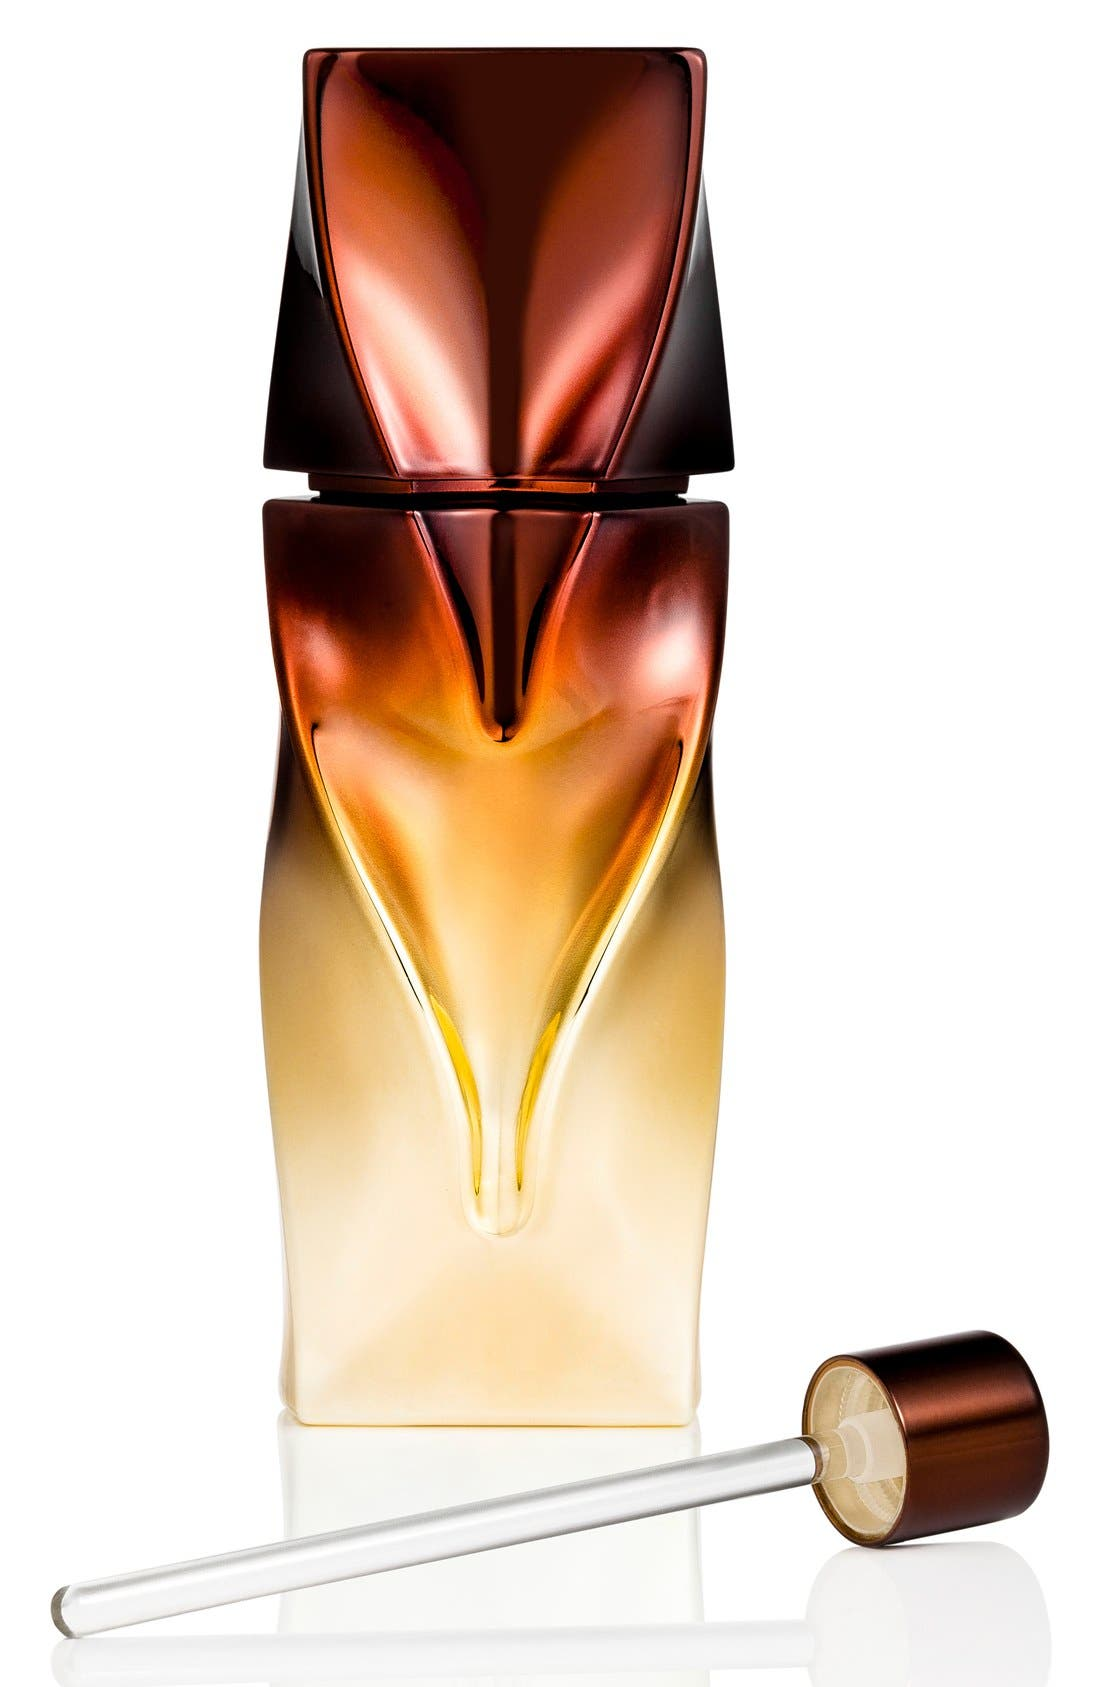 Christian Loubutin Bikini Questa Sera Perfume Oil